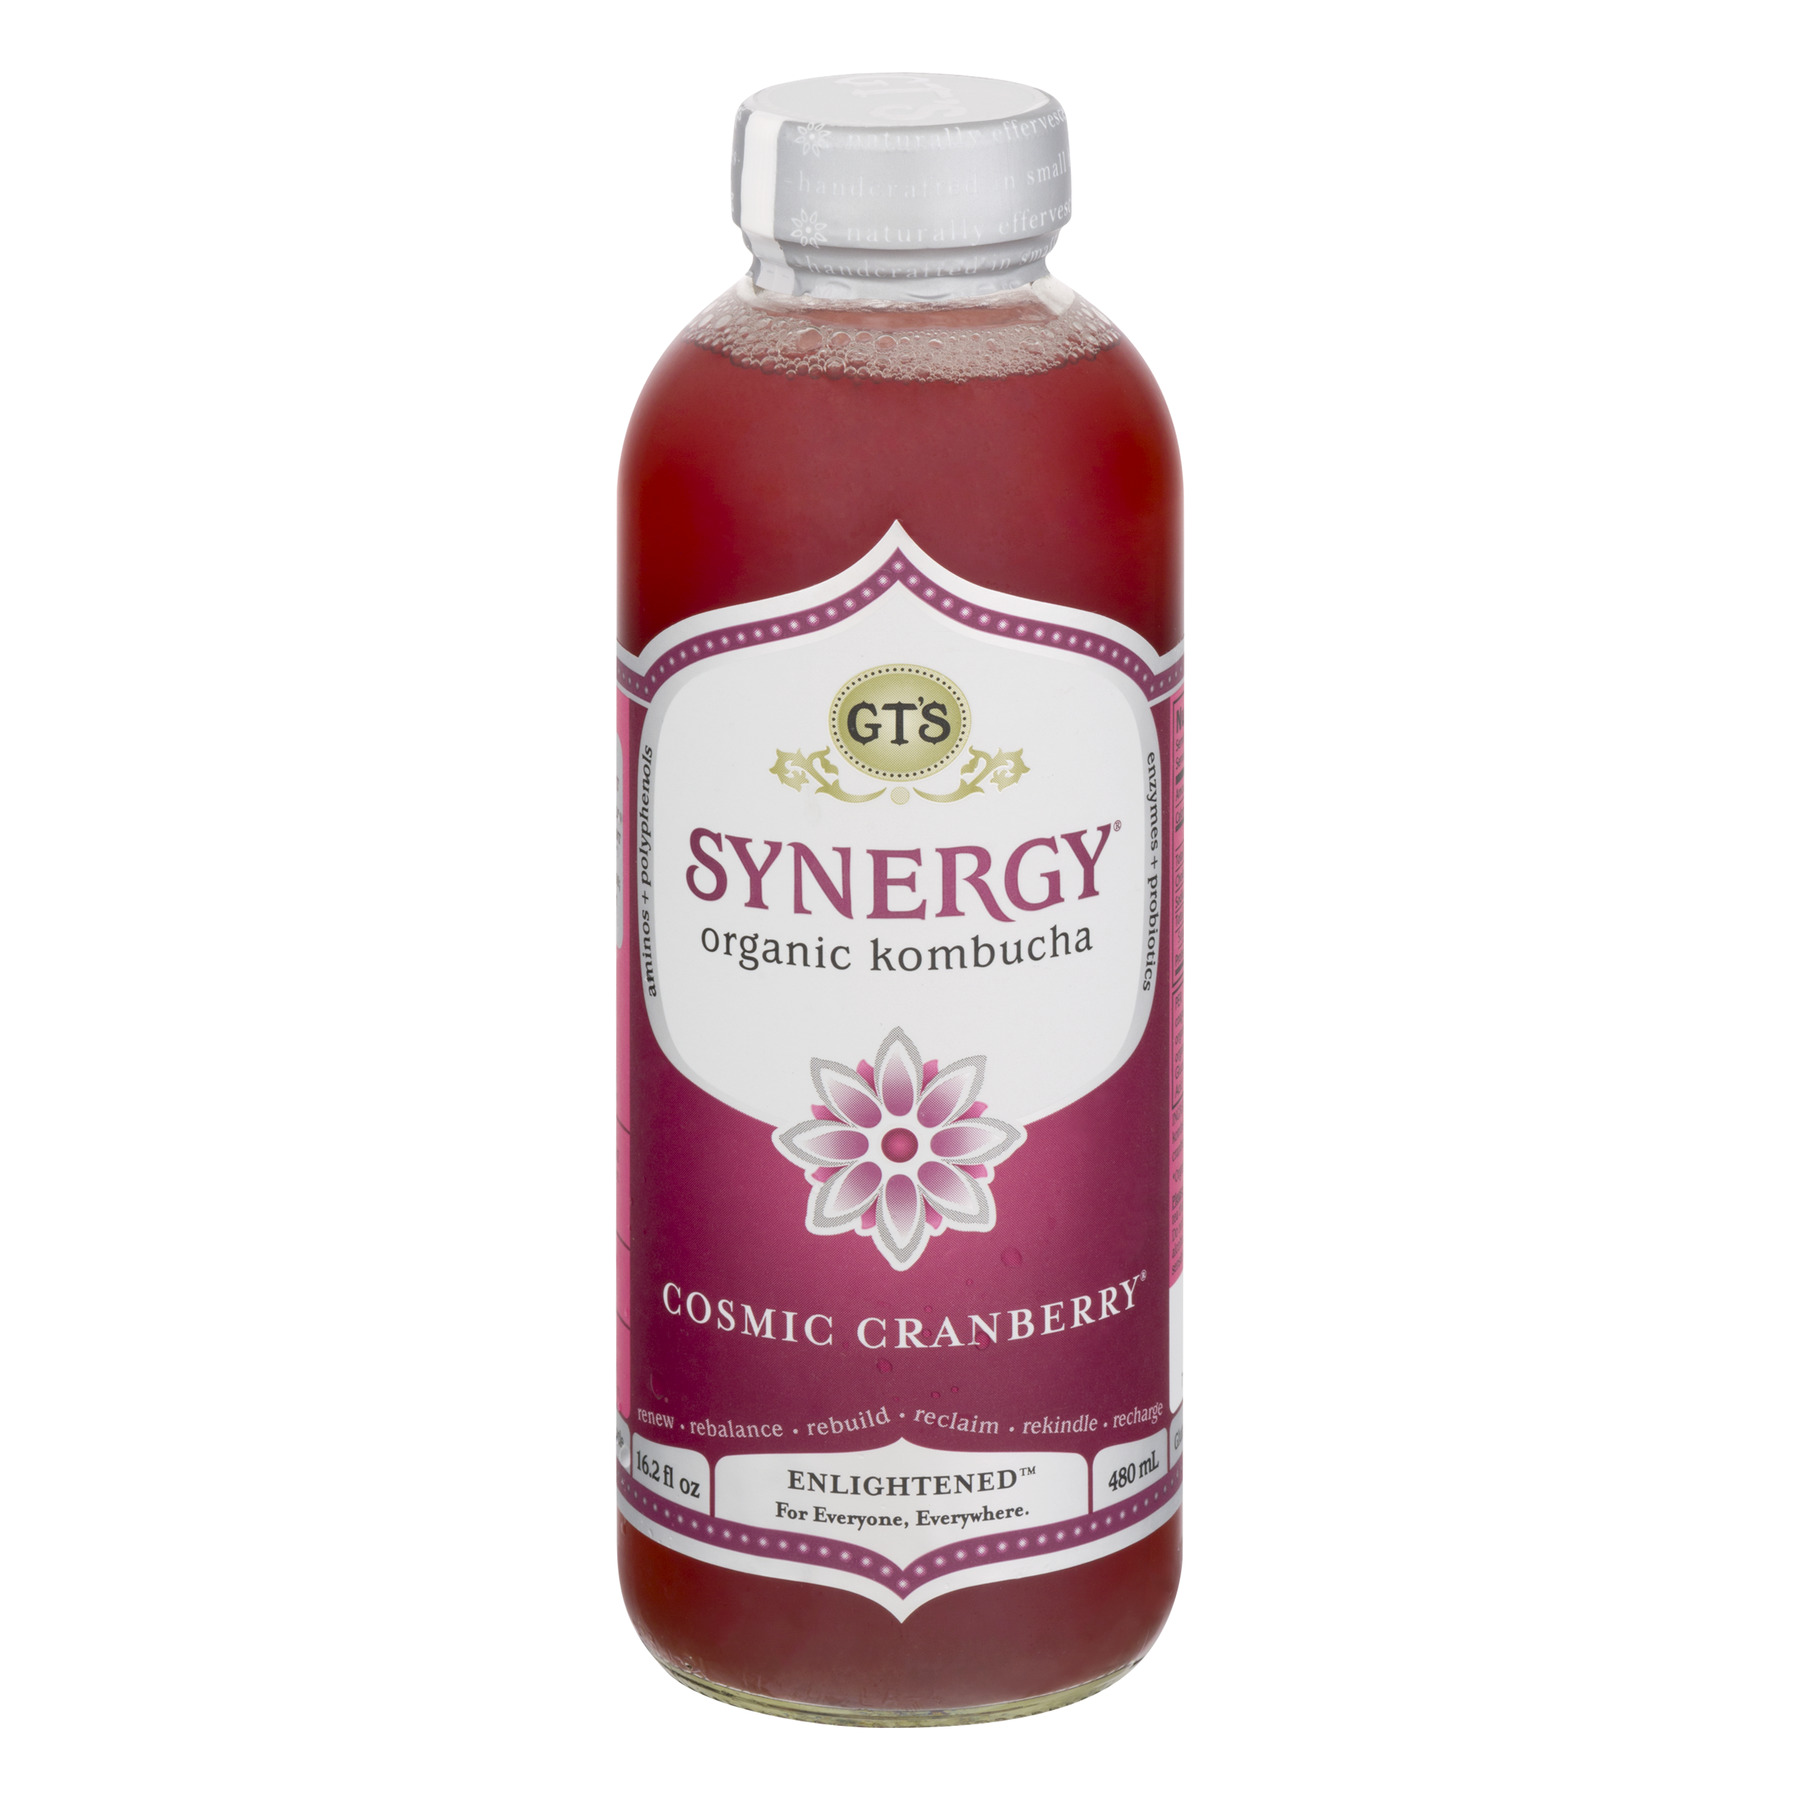 Gt's Synergy Organic Kombucha Cosmic Cranberry, 16.2 Fl Oz by Gt's